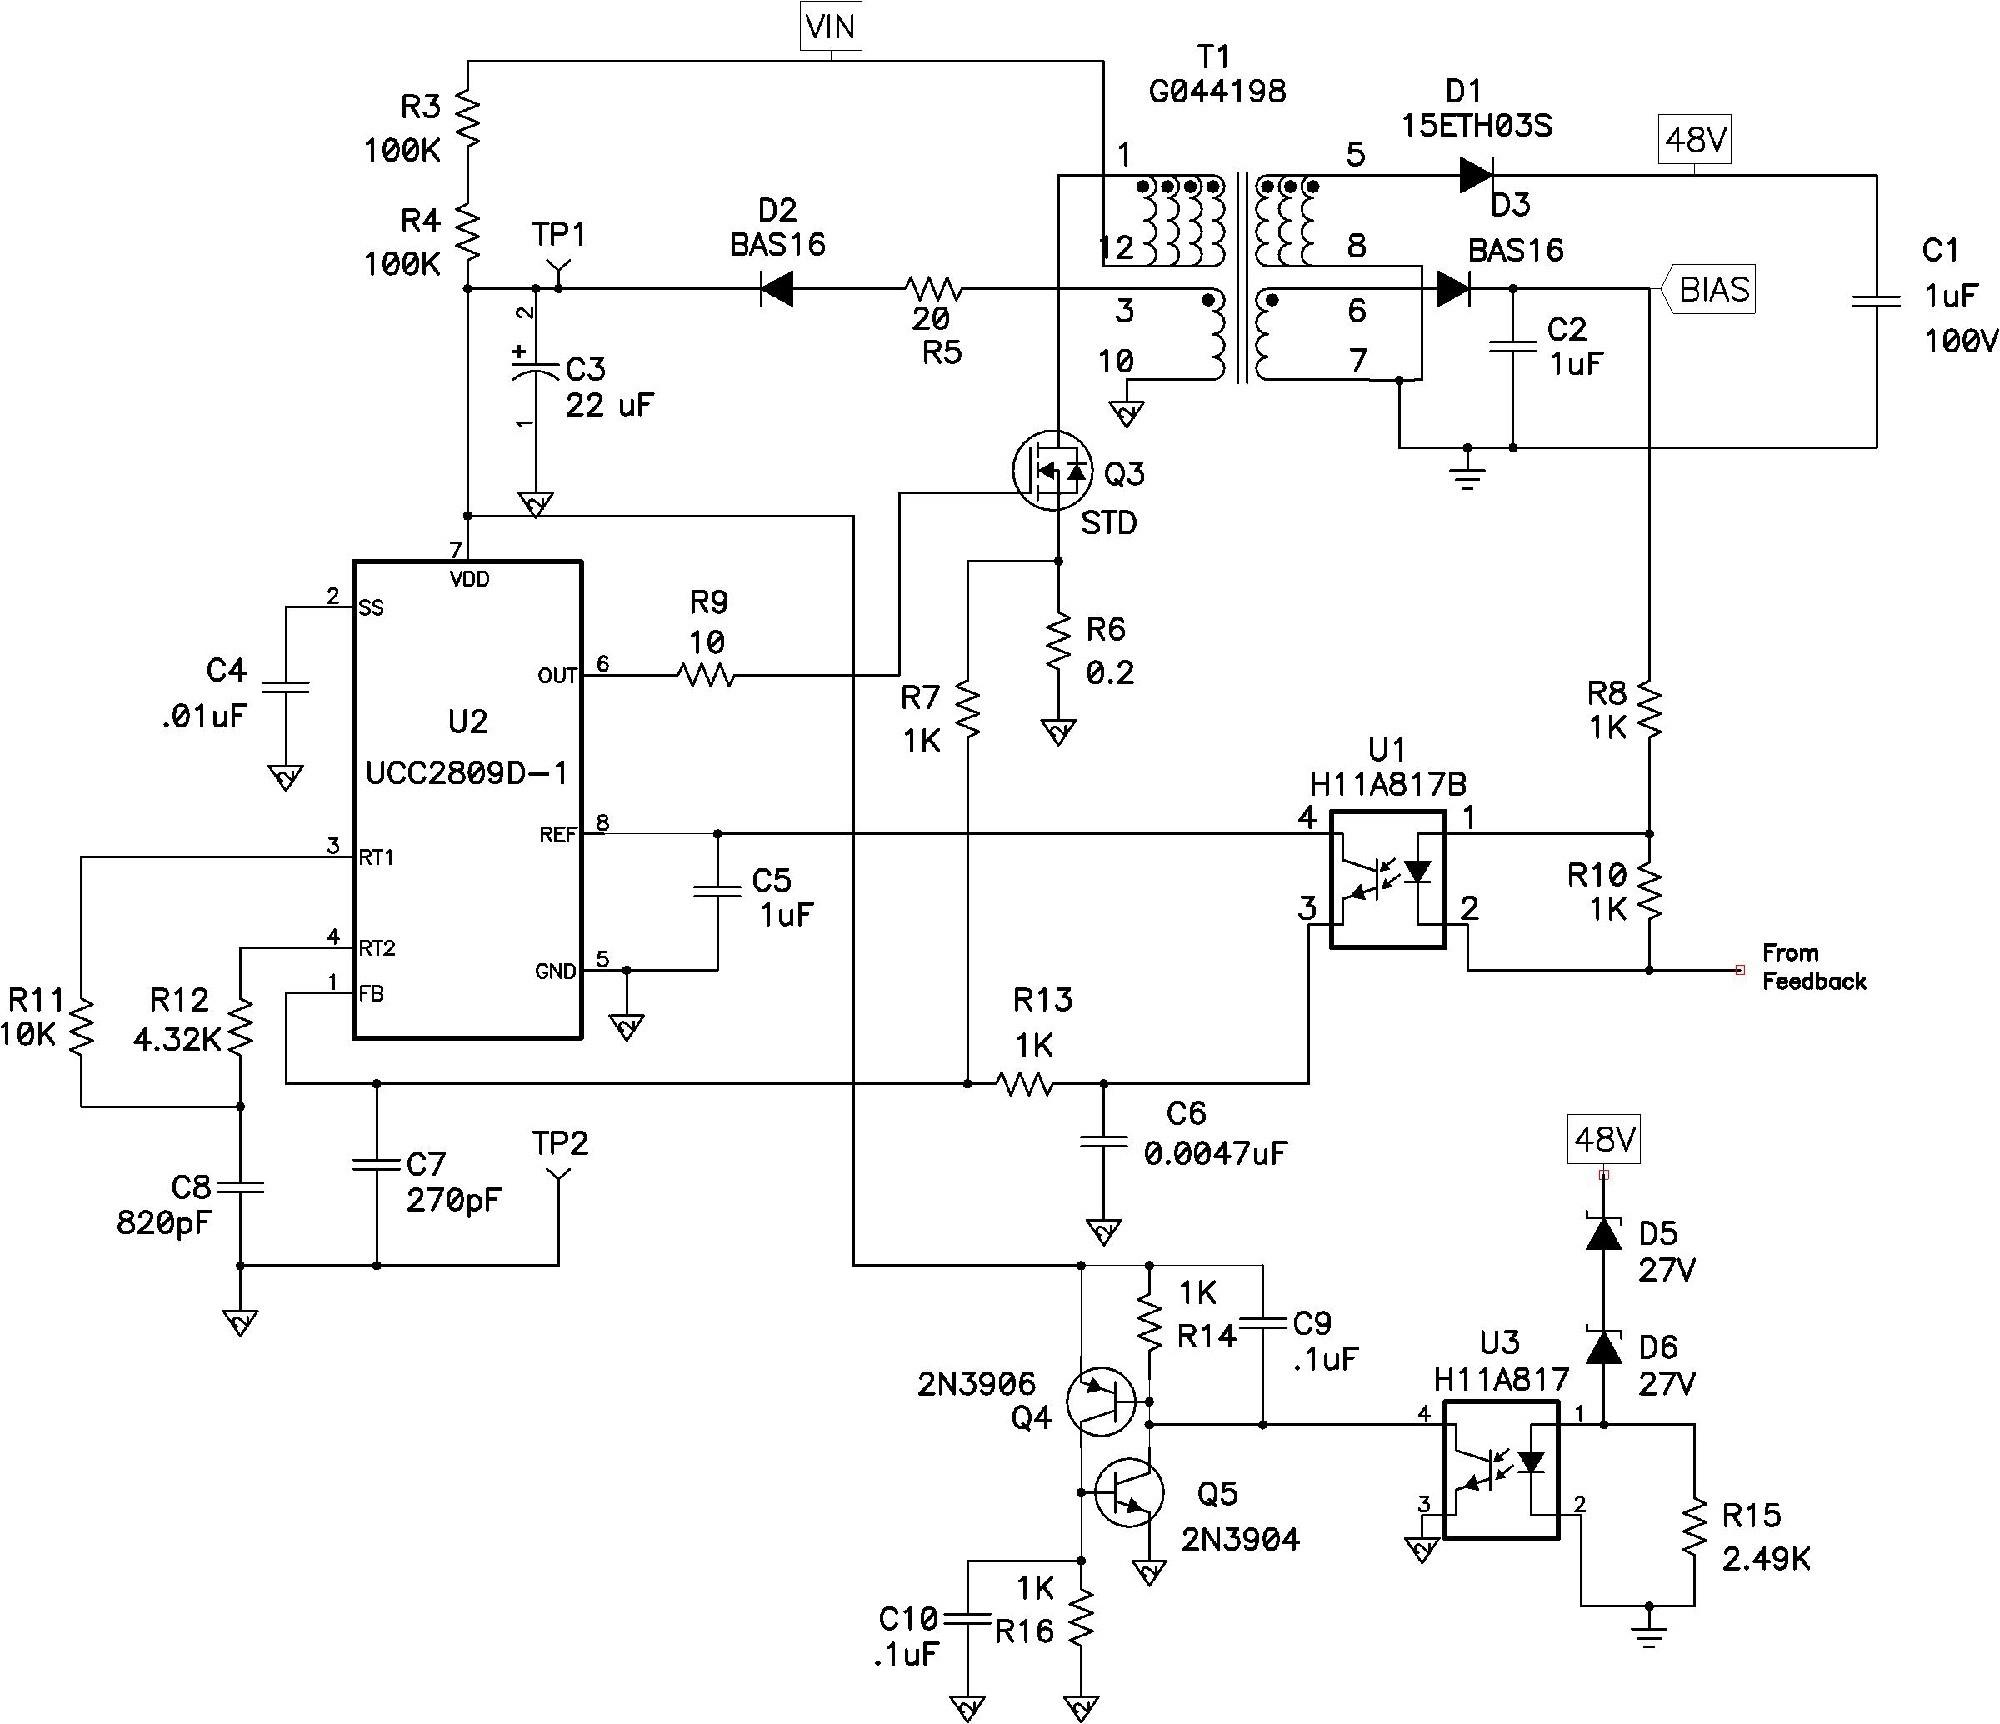 Tattoo Power Supply Wiring Diagram Wiring Diagram Image